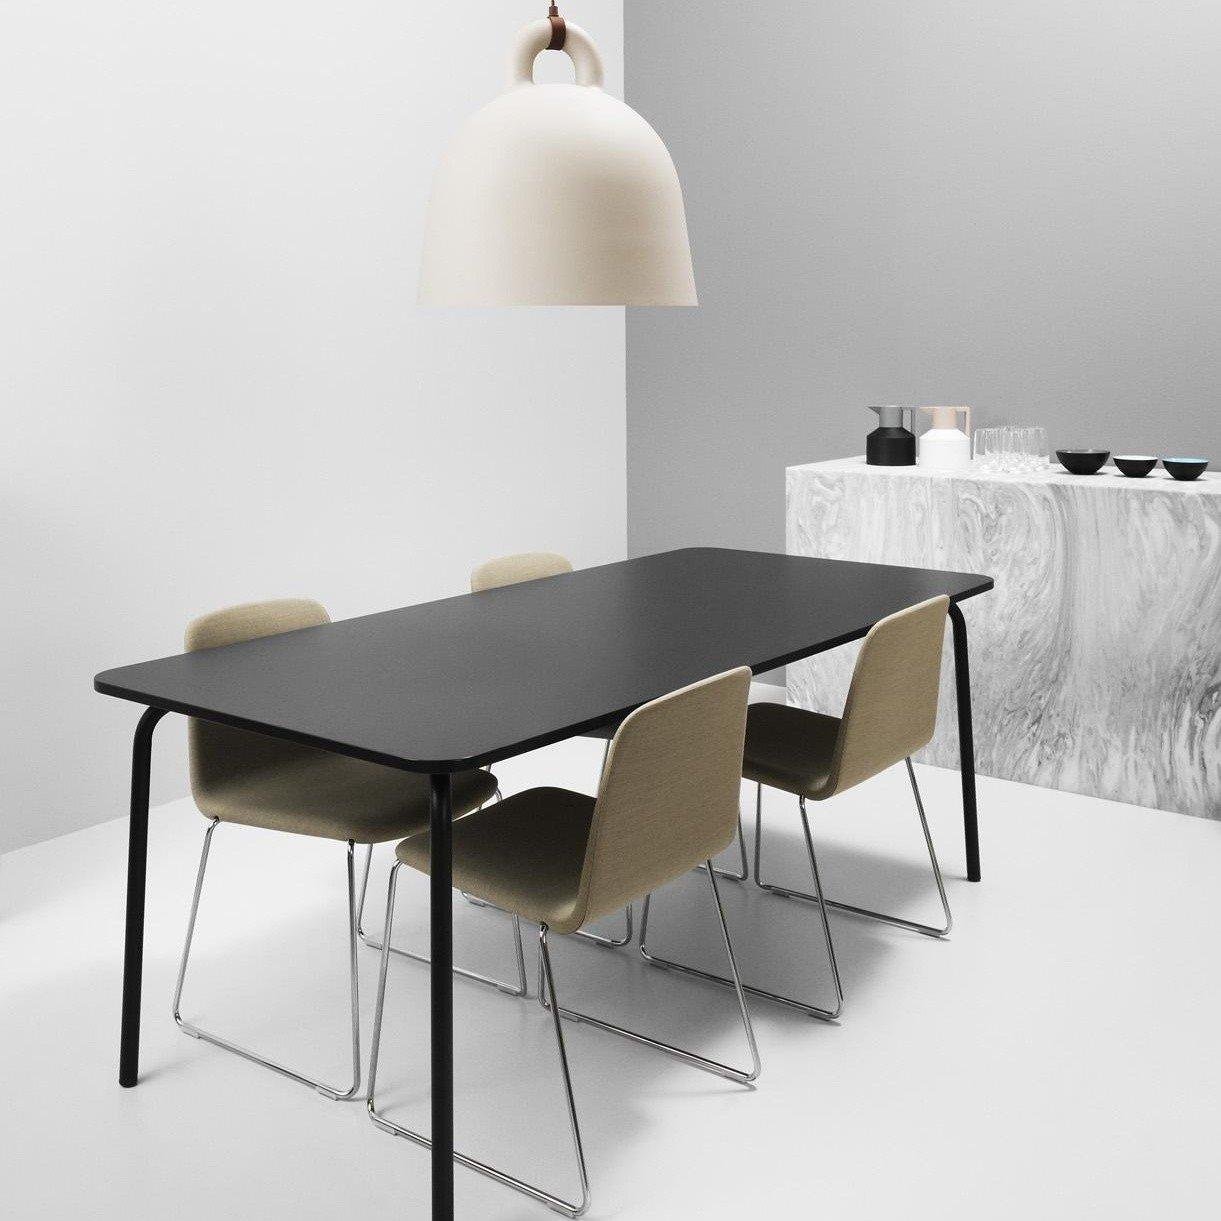 just chair chaise normann copenhagen. Black Bedroom Furniture Sets. Home Design Ideas